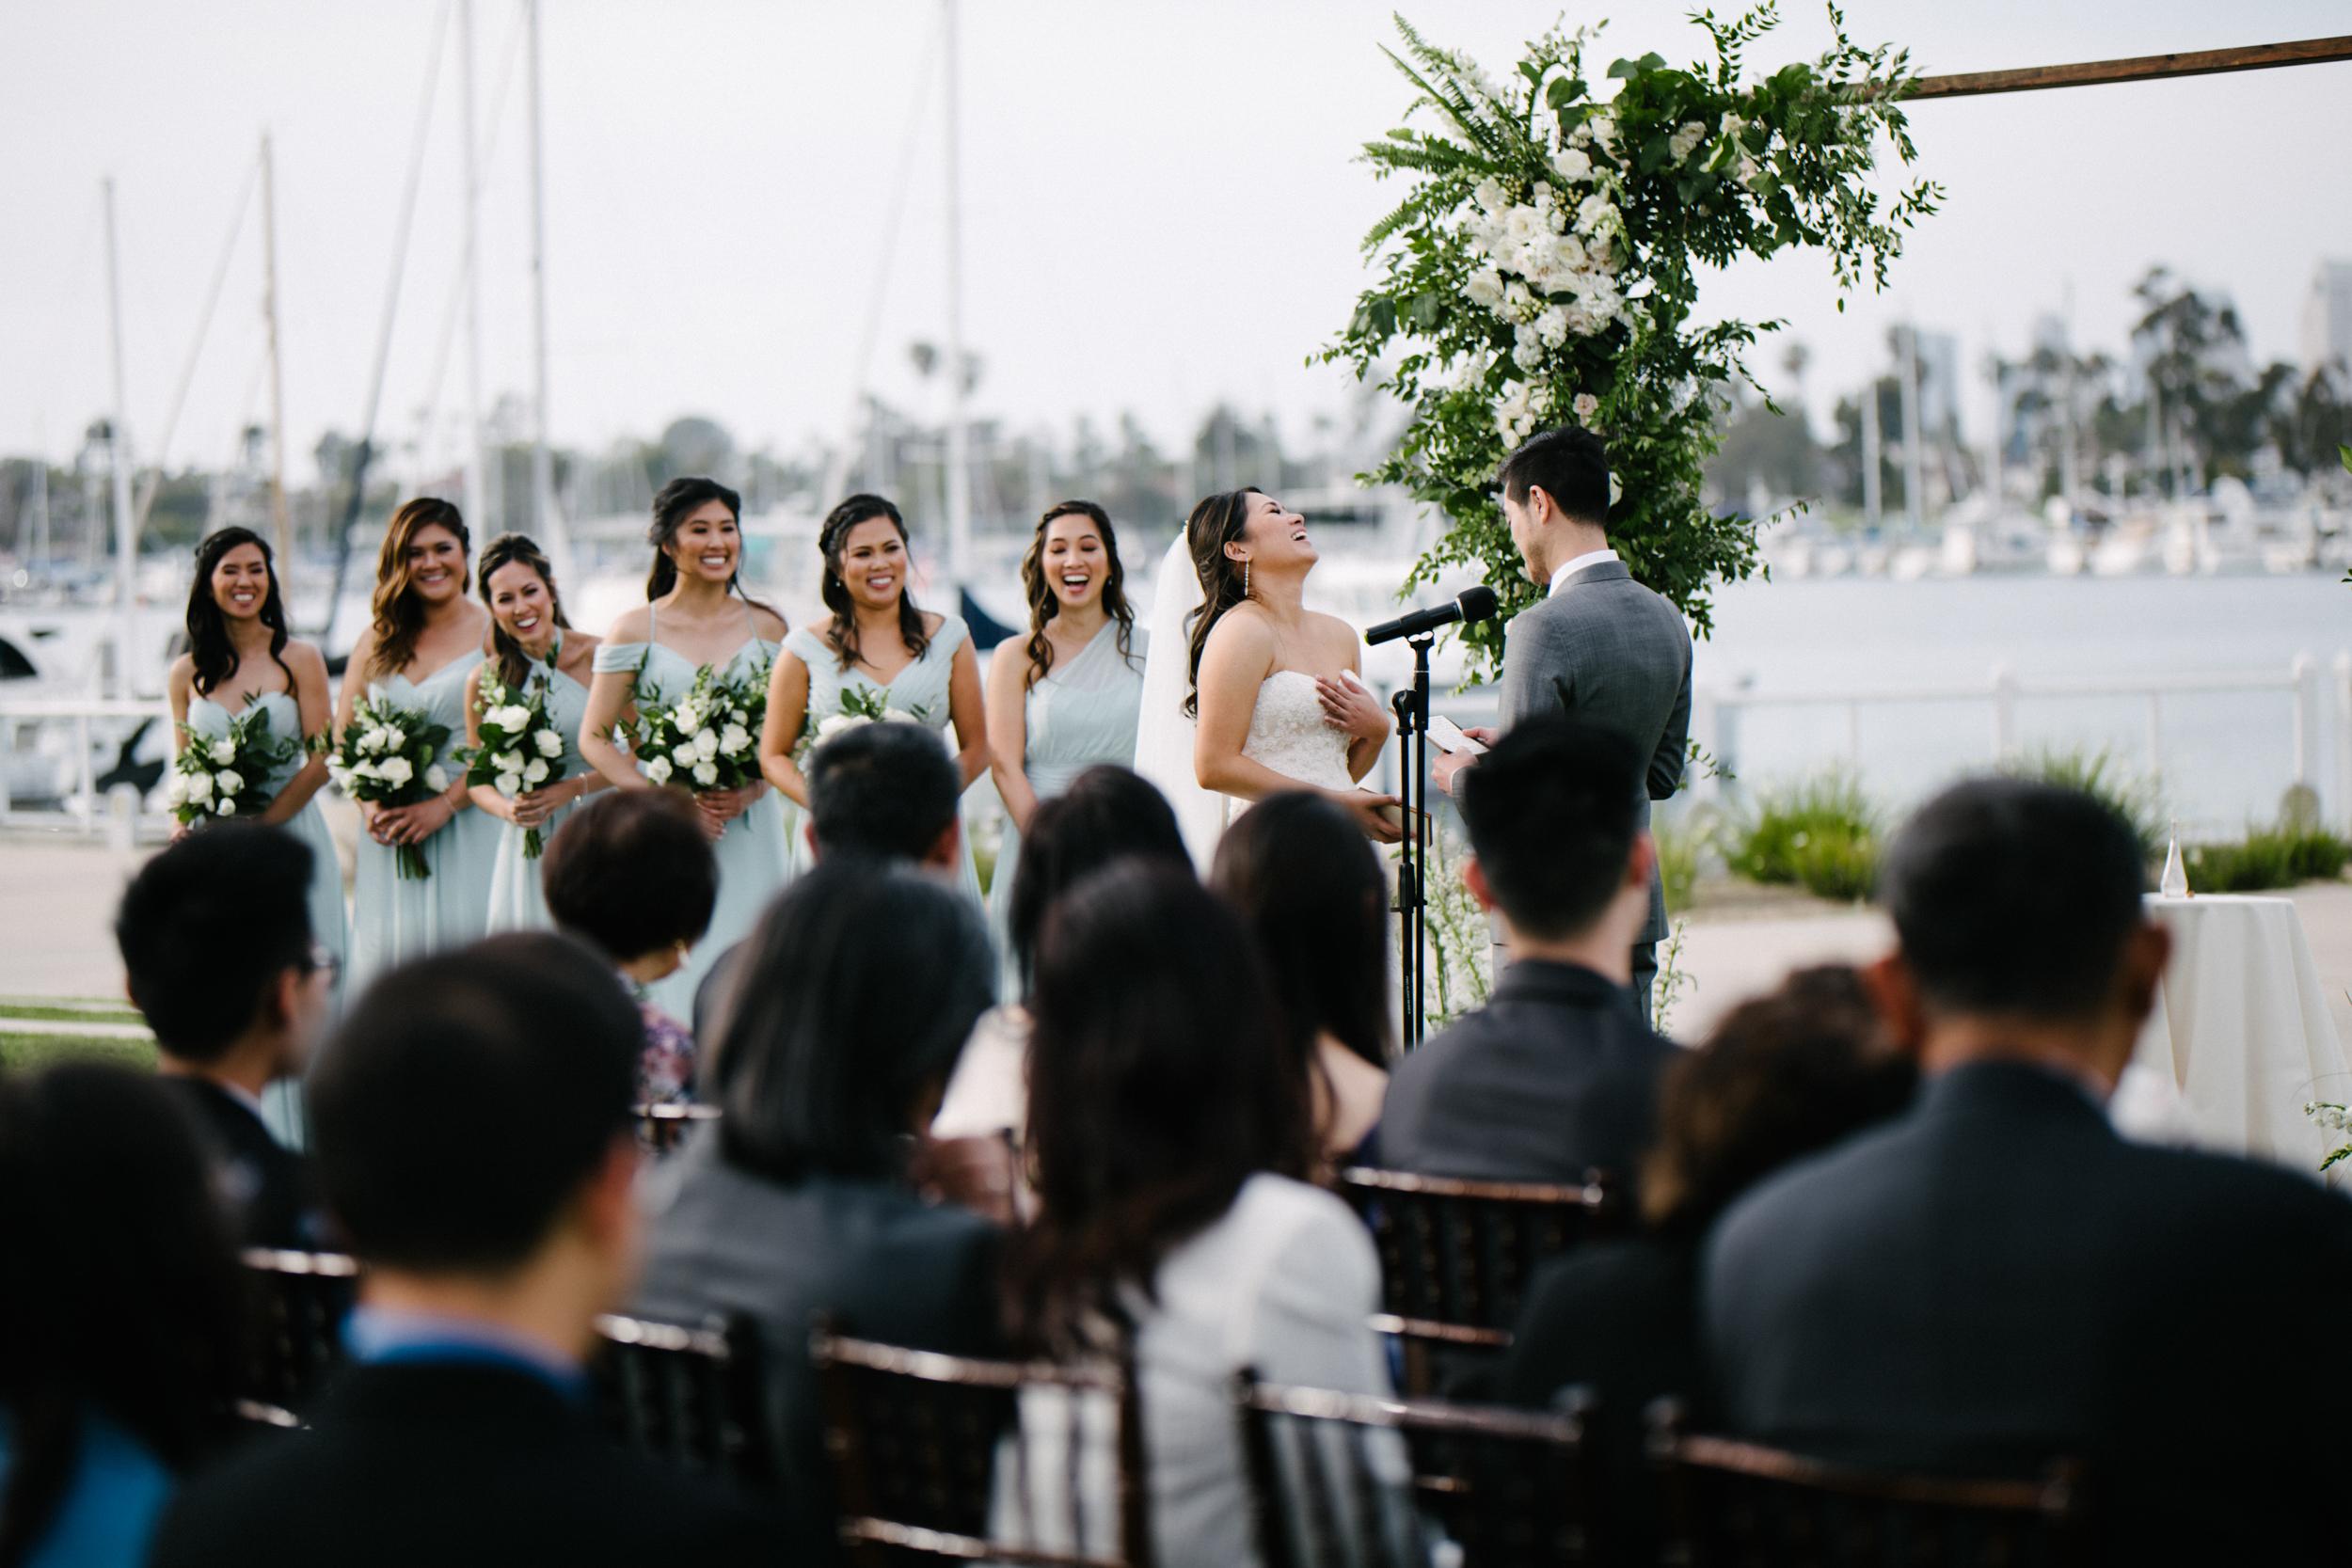 wedding_coronado_community_center-23.jpg